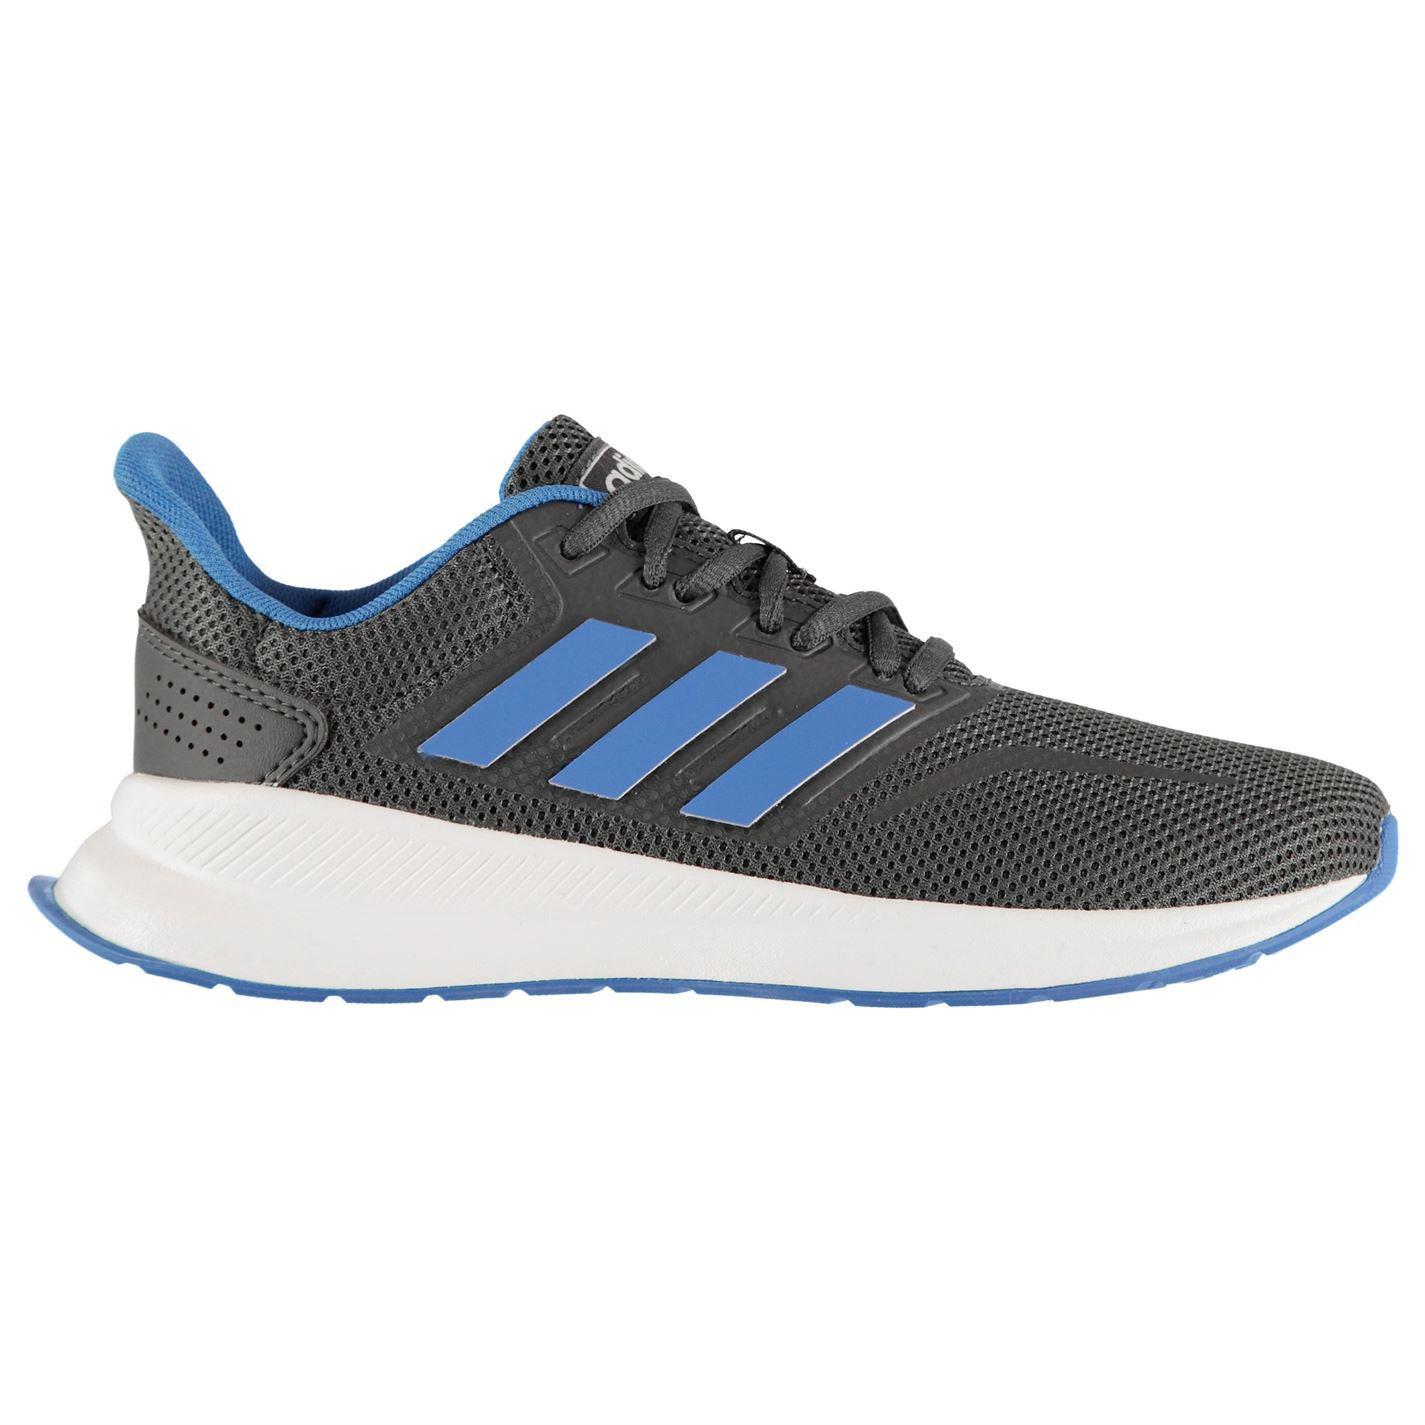 adidas-Falcon-Trainers-Junior-Boys-Shoes-Footwear thumbnail 7